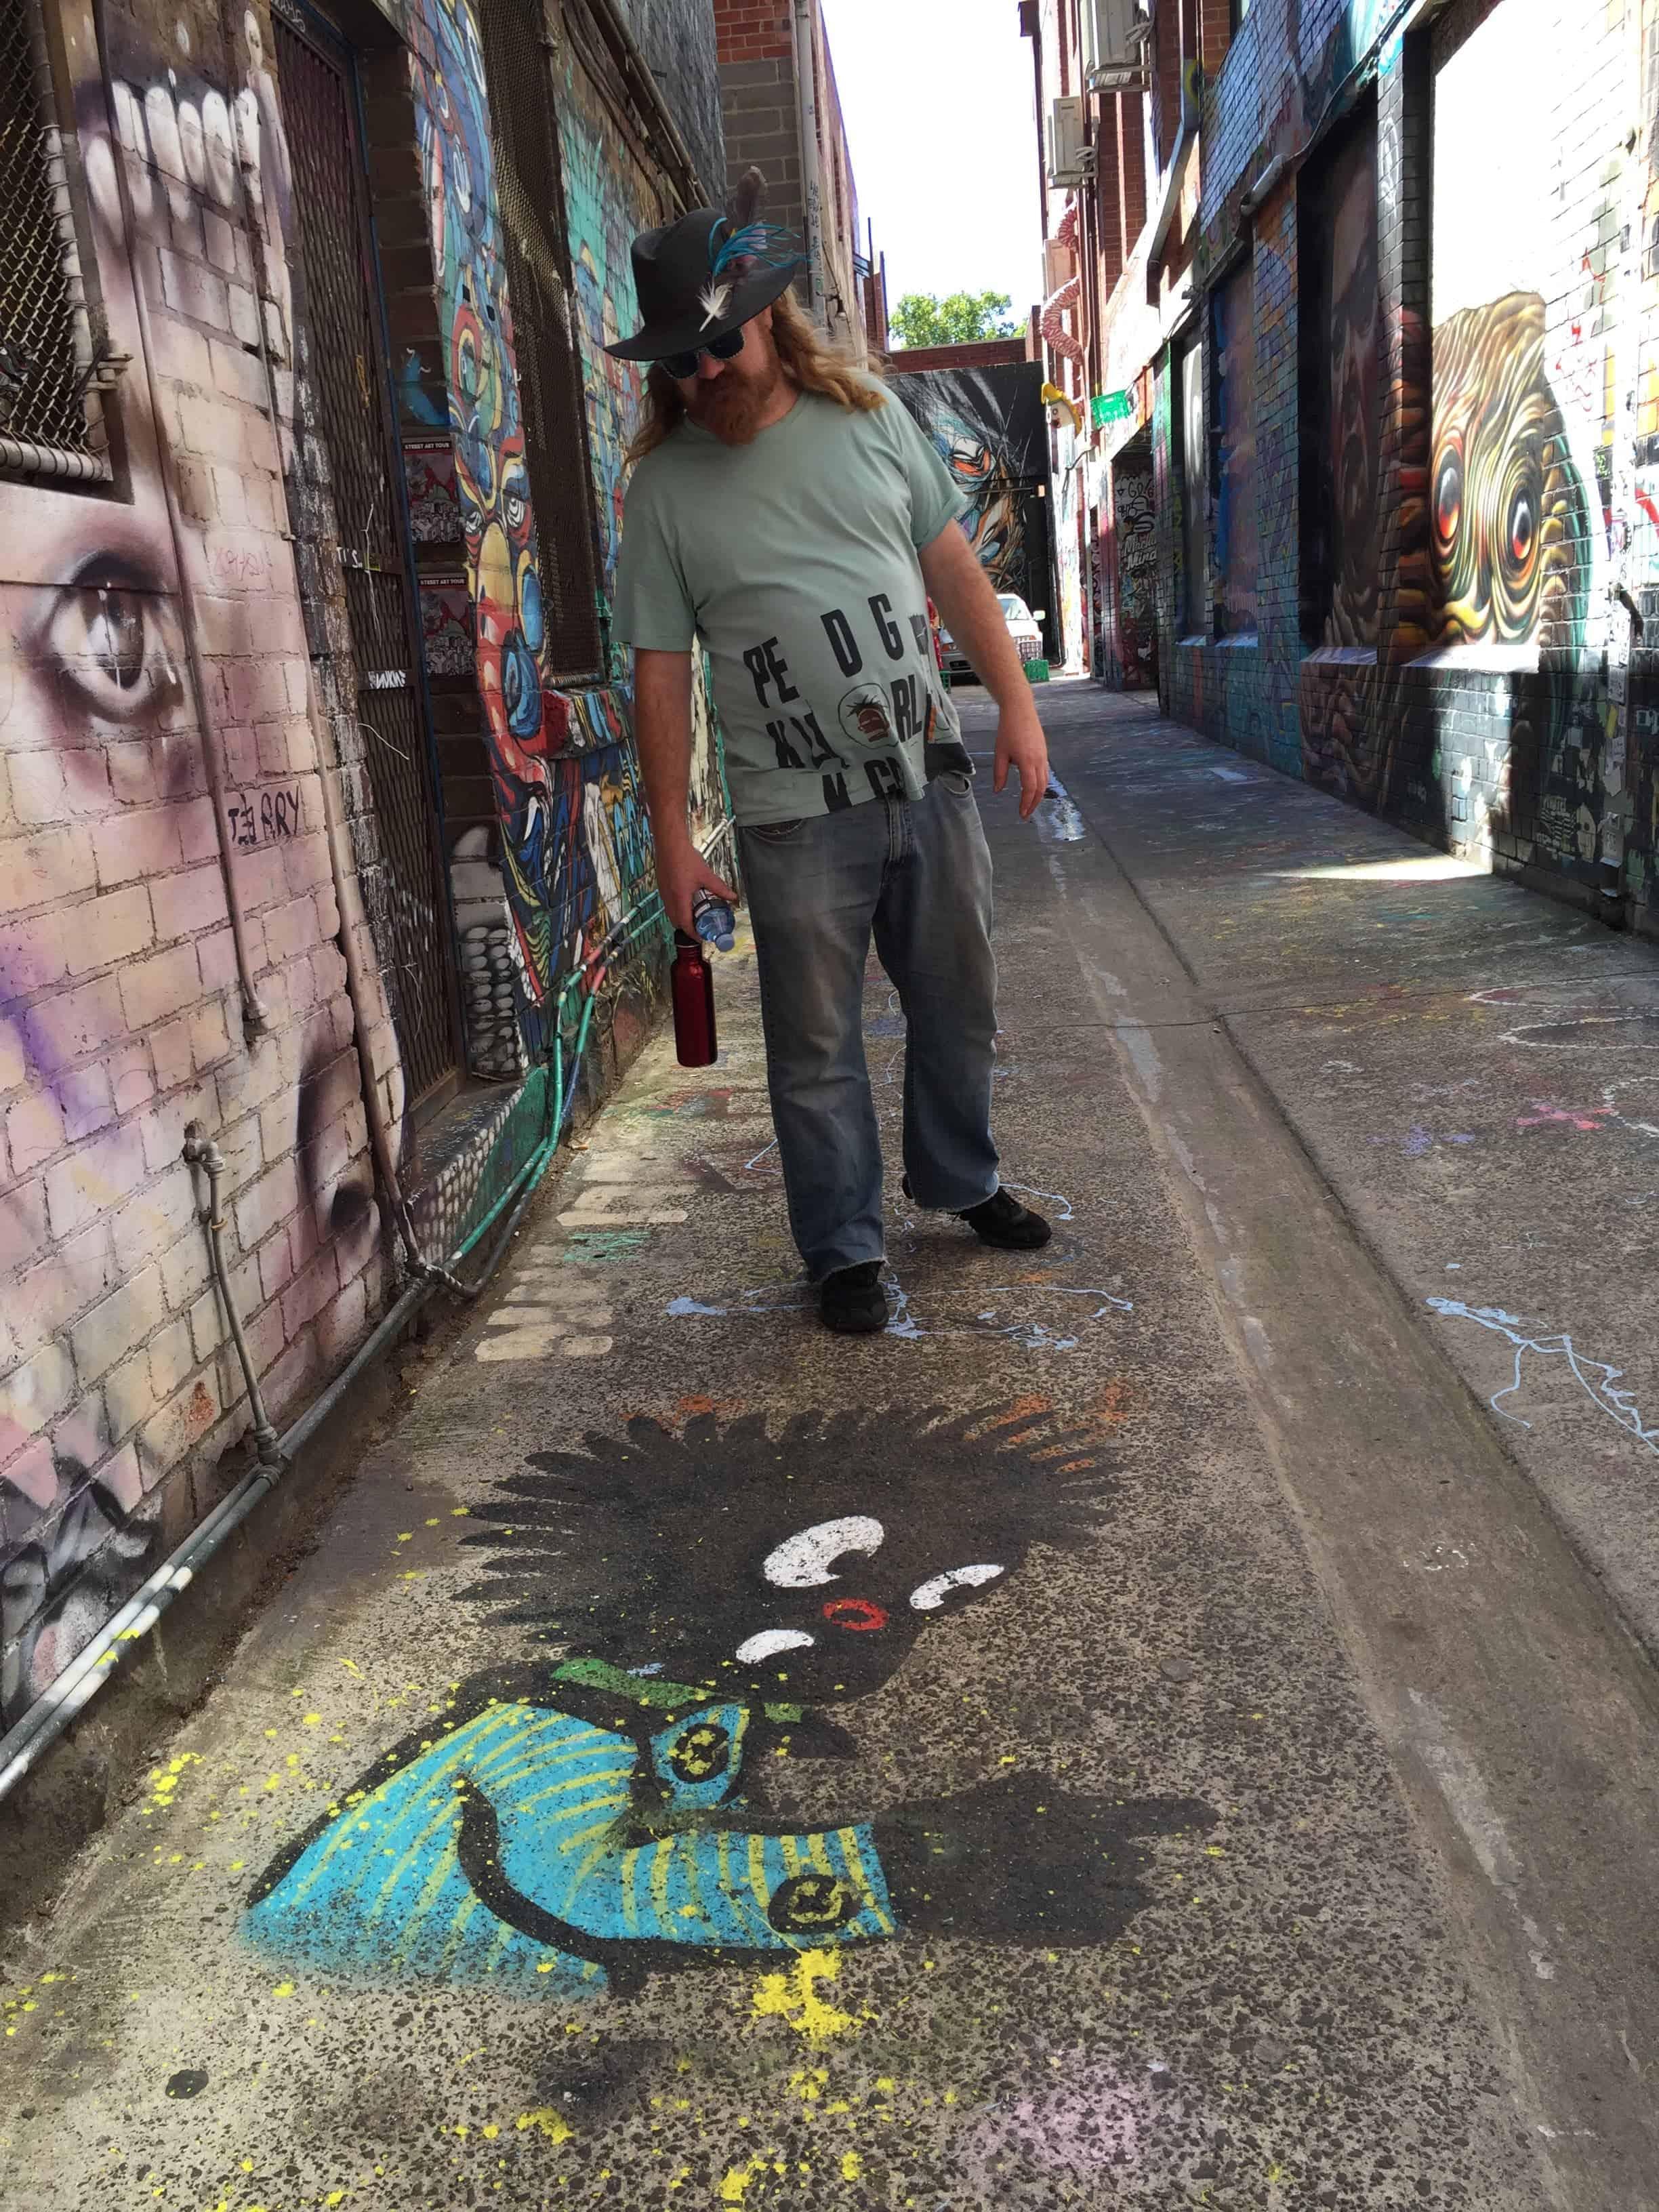 Melbourne Street Art Tours. Australia road trip